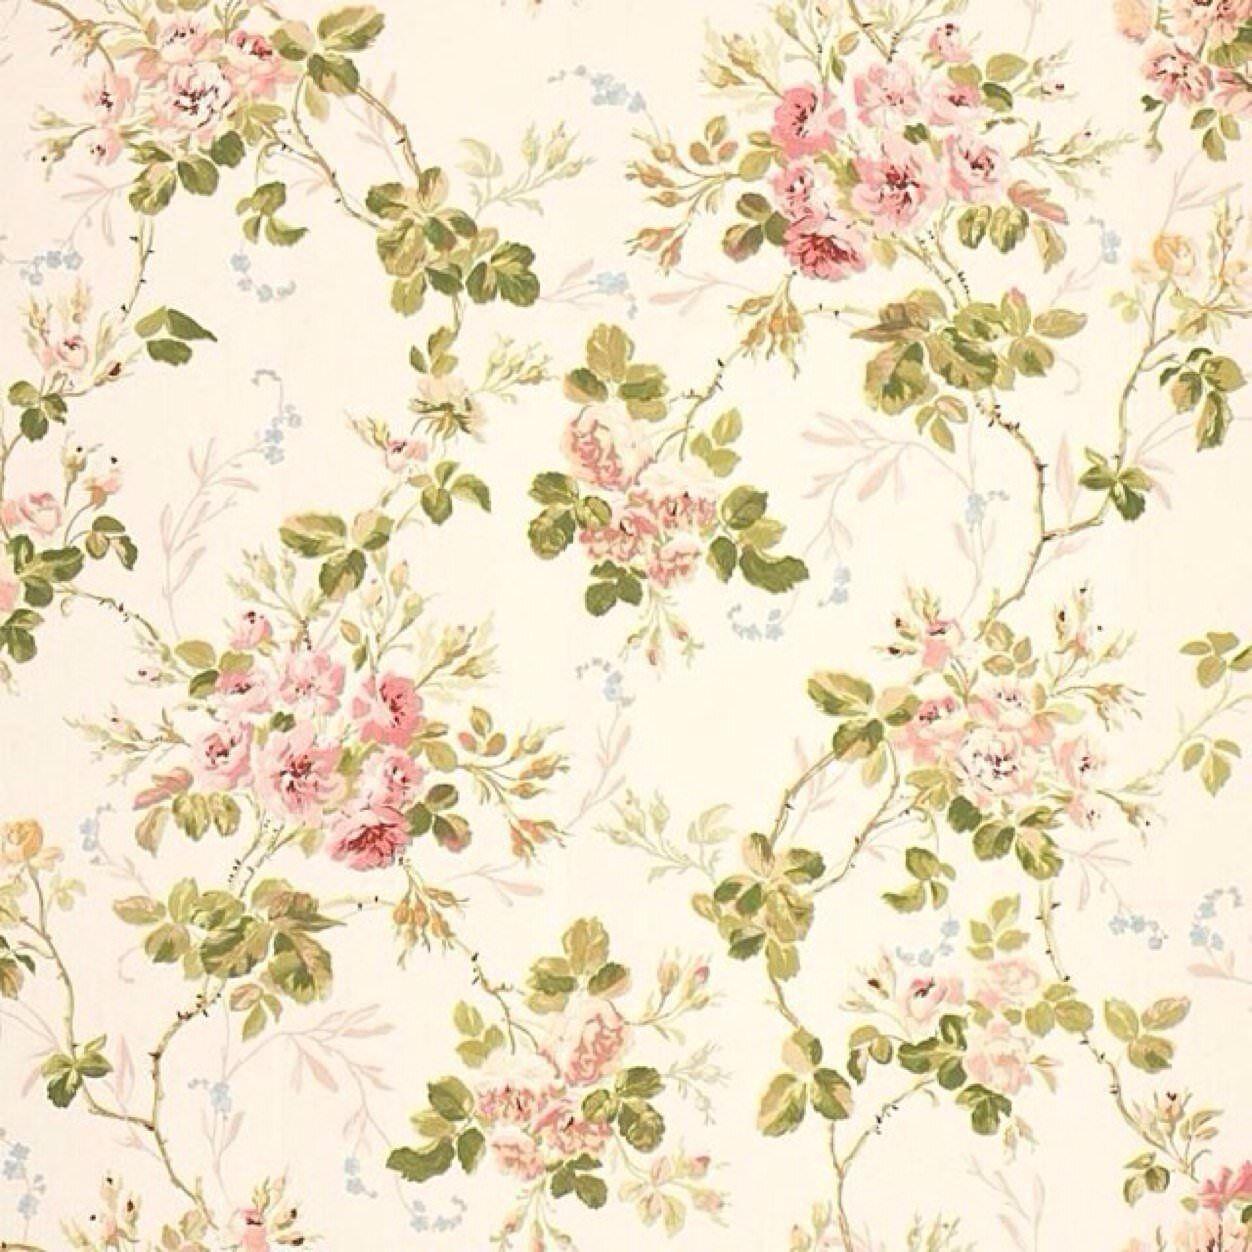 Pin By Leslie Saiz On Wallpaper Vintage Floral Wallpapers Vintage Flowers Wallpaper Vintage Flower Backgrounds